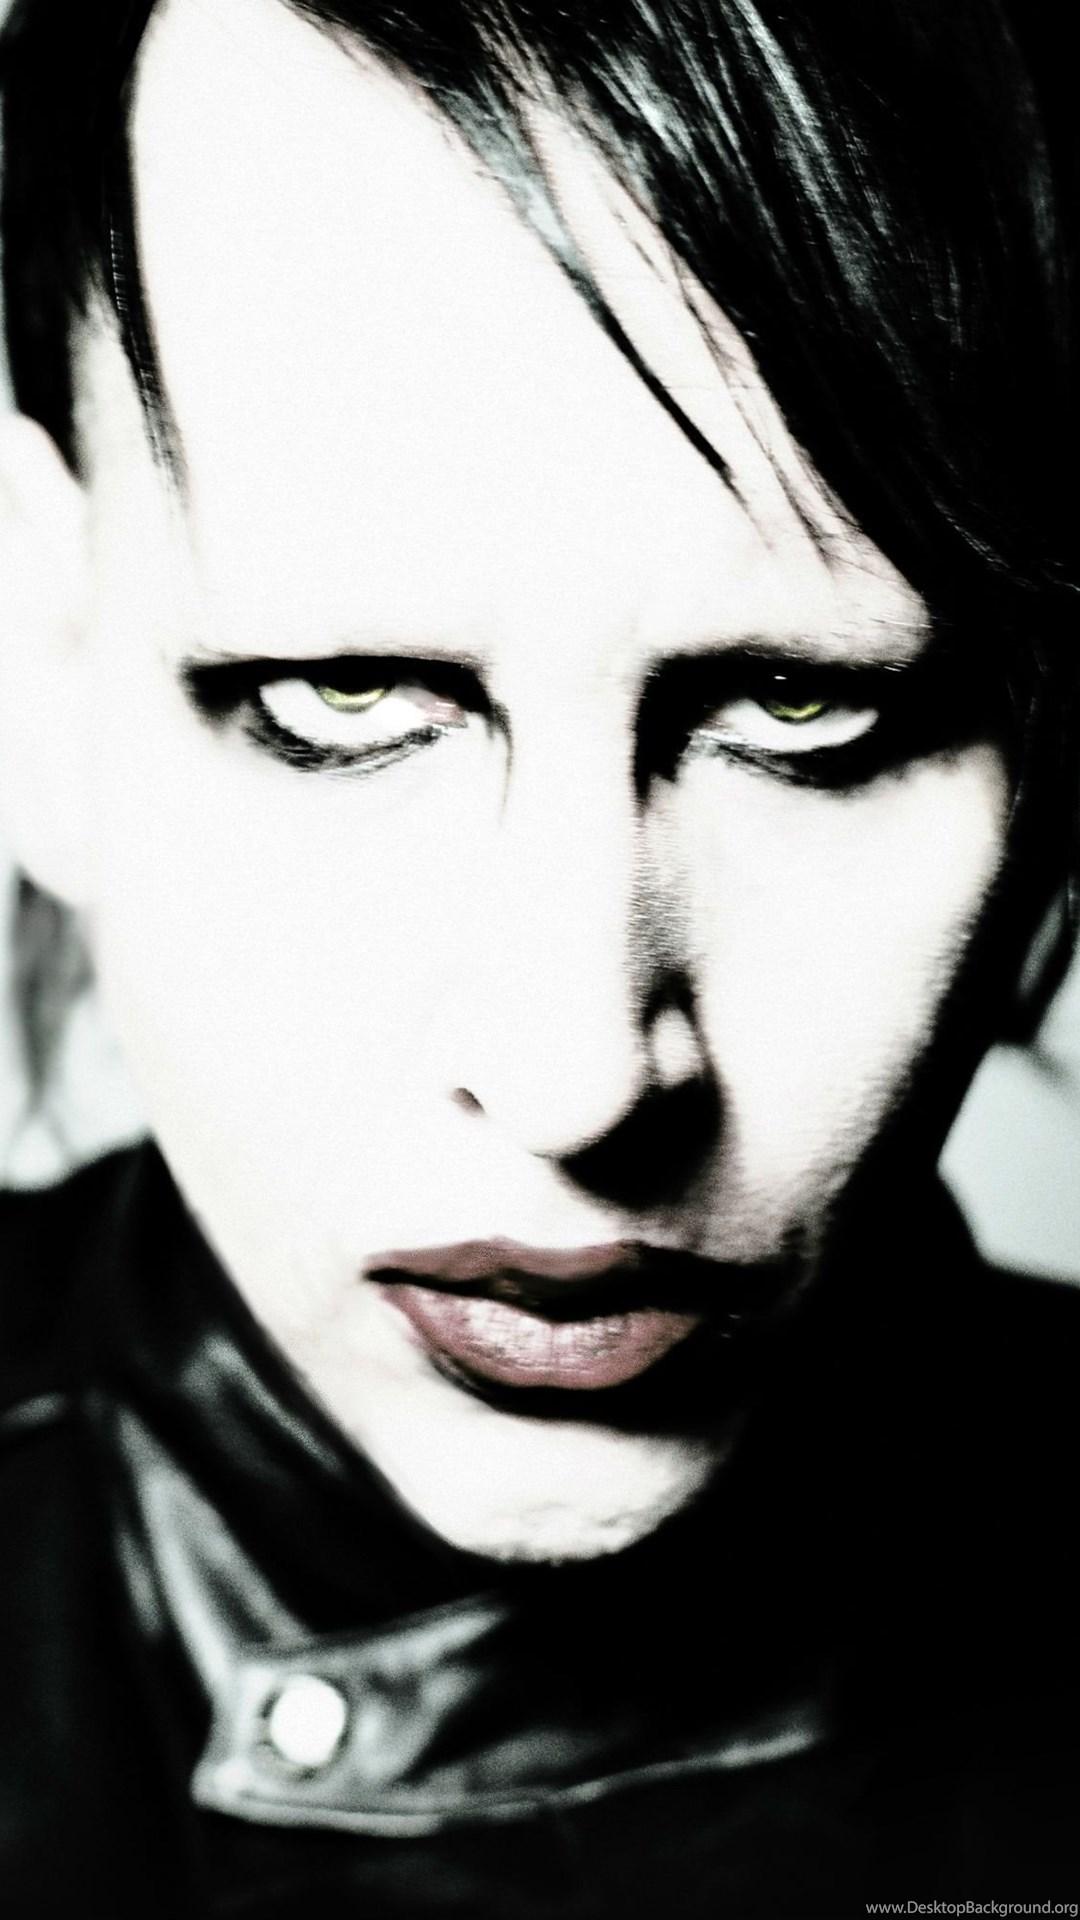 Marilyn Manson Wallpapers Wallpapers Cave Desktop Background